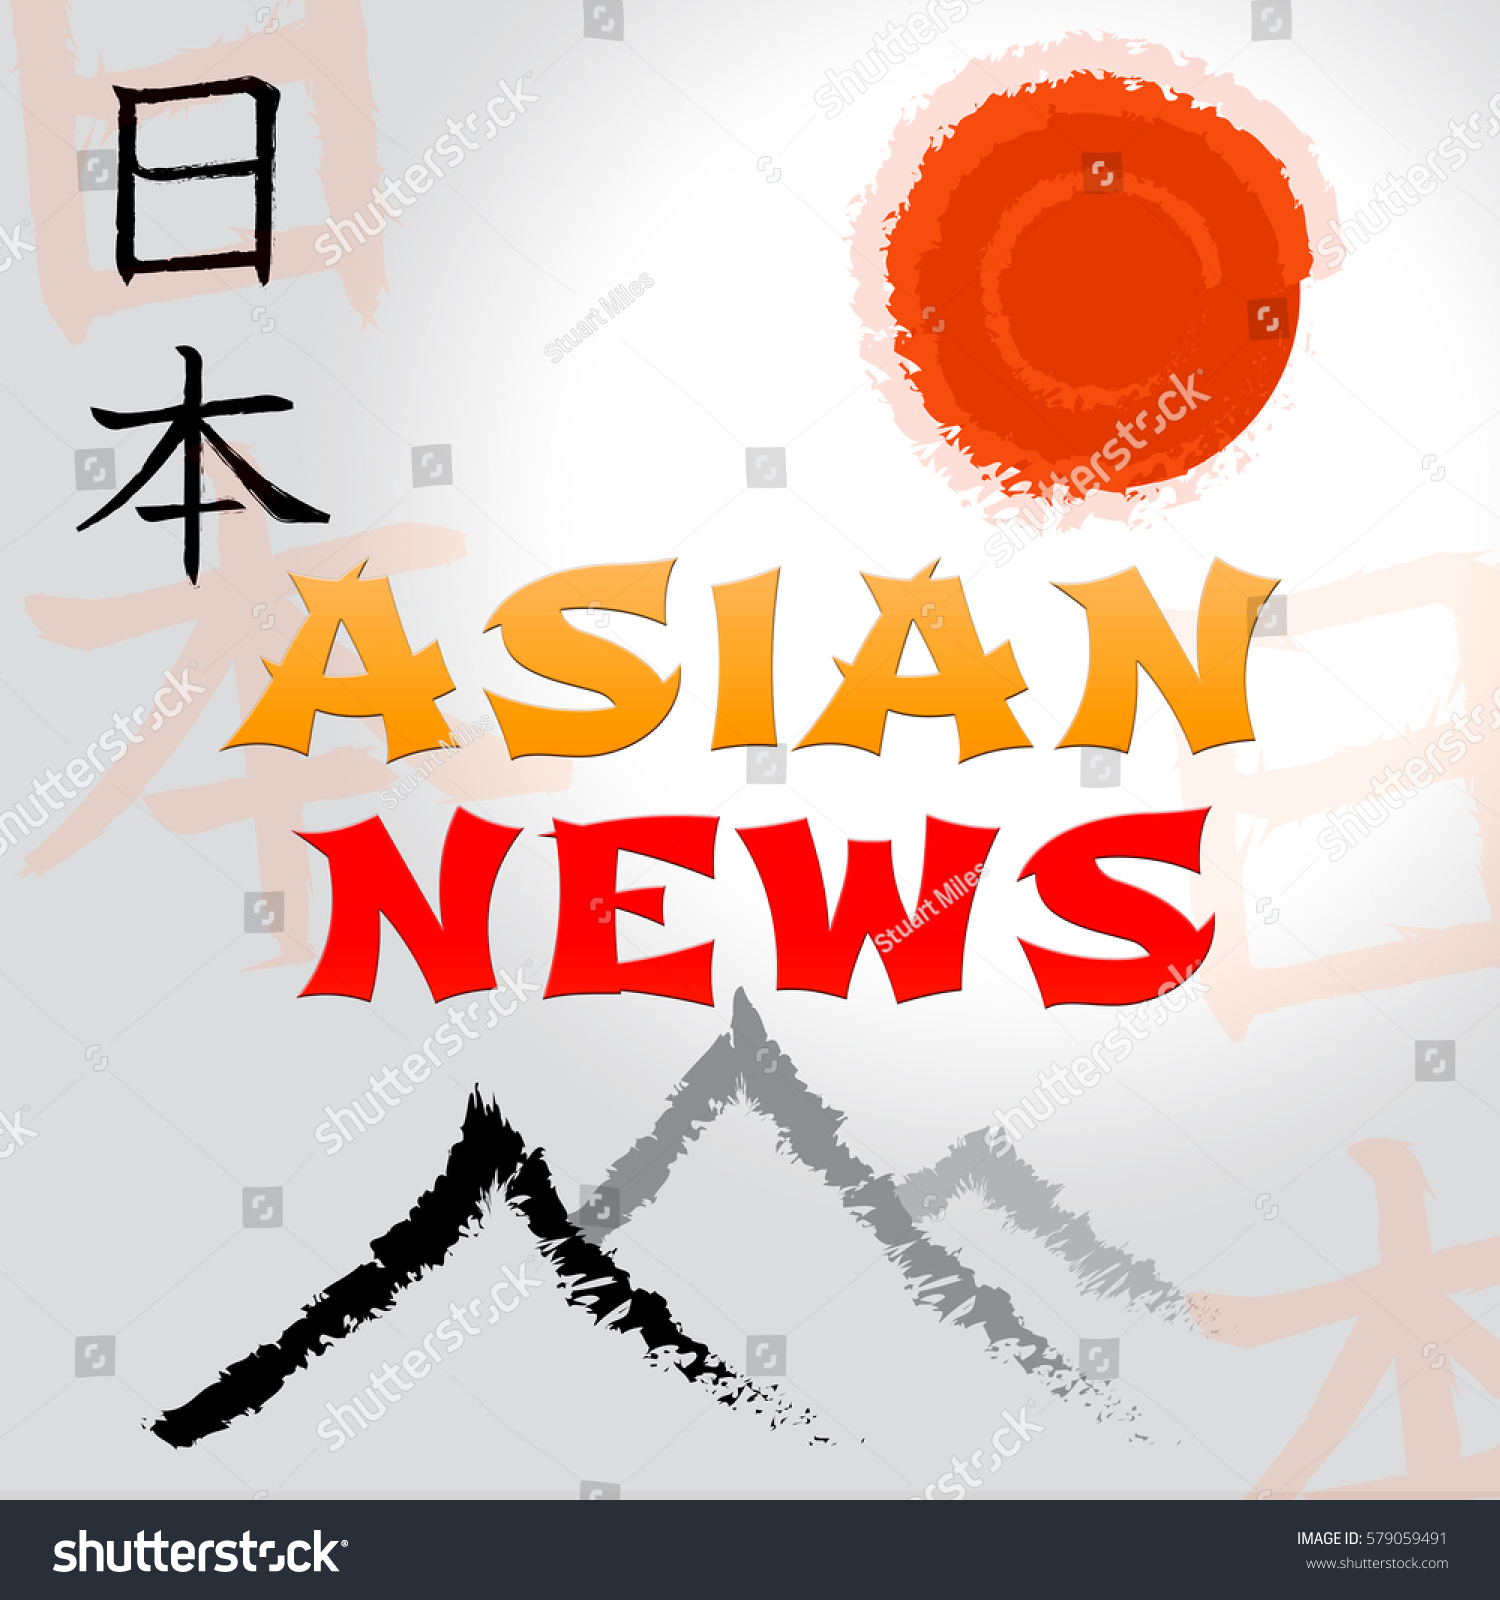 Asian News Mountain Sun Symbols Shows Stock Illustration 579059491